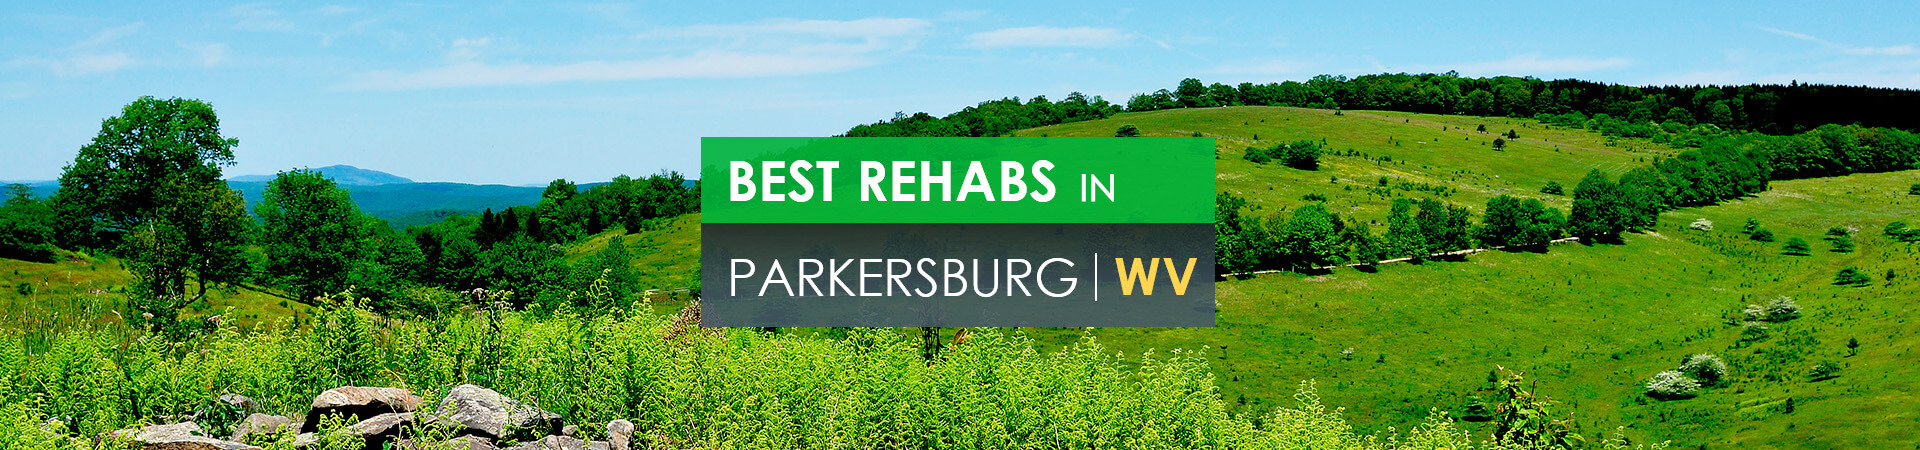 Best rehabs in Parkersburg, WV